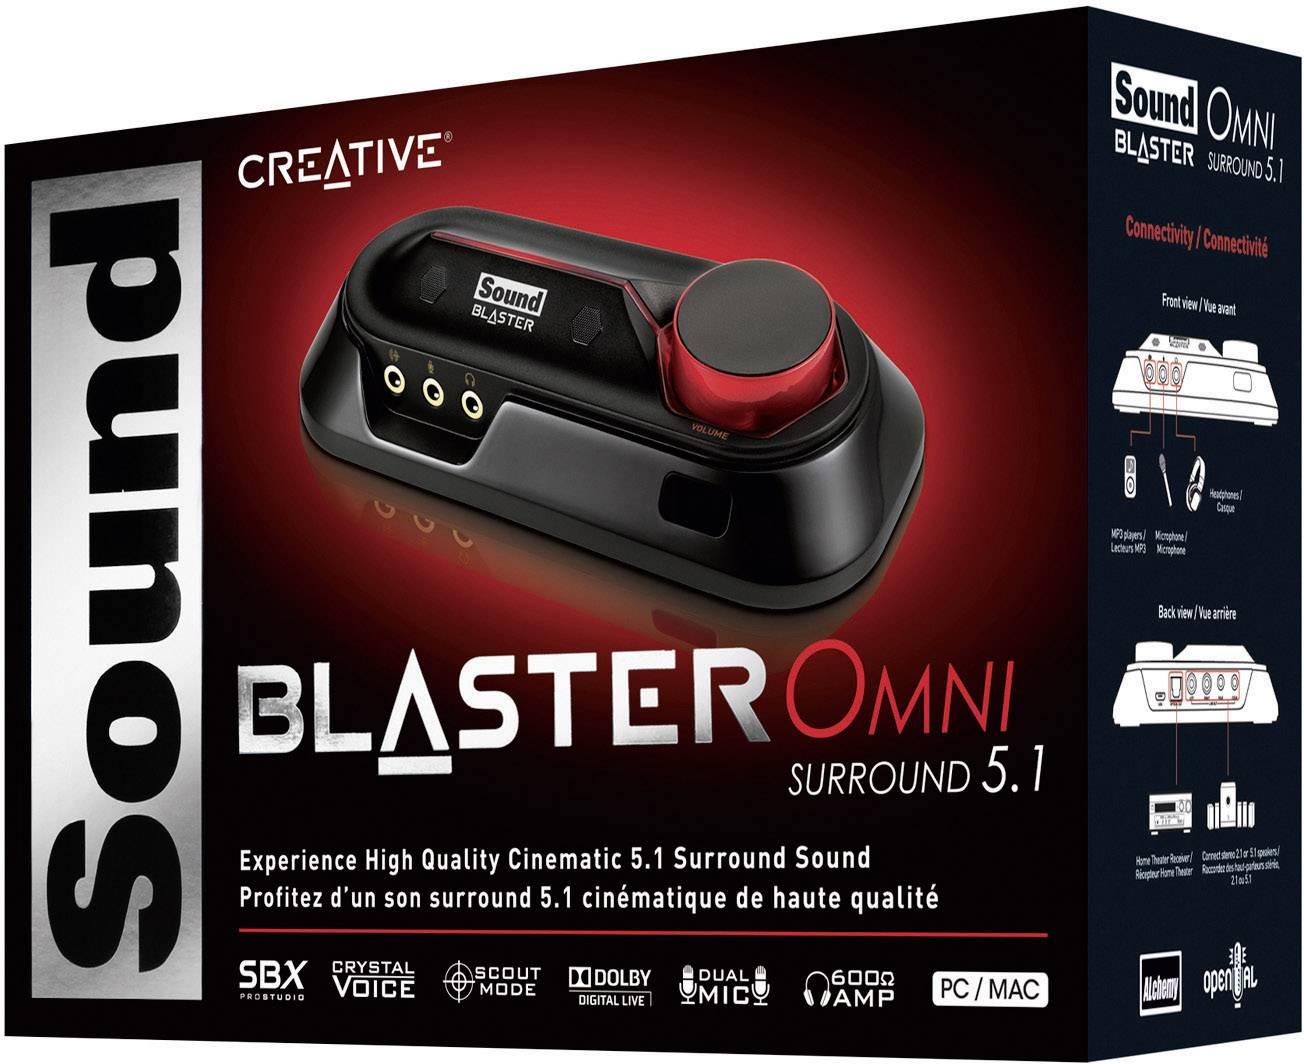 Wonderbaarlijk 5.1 Externe geluidskaart Sound Blaster Omni Surround 5.1 Digitale GY-64